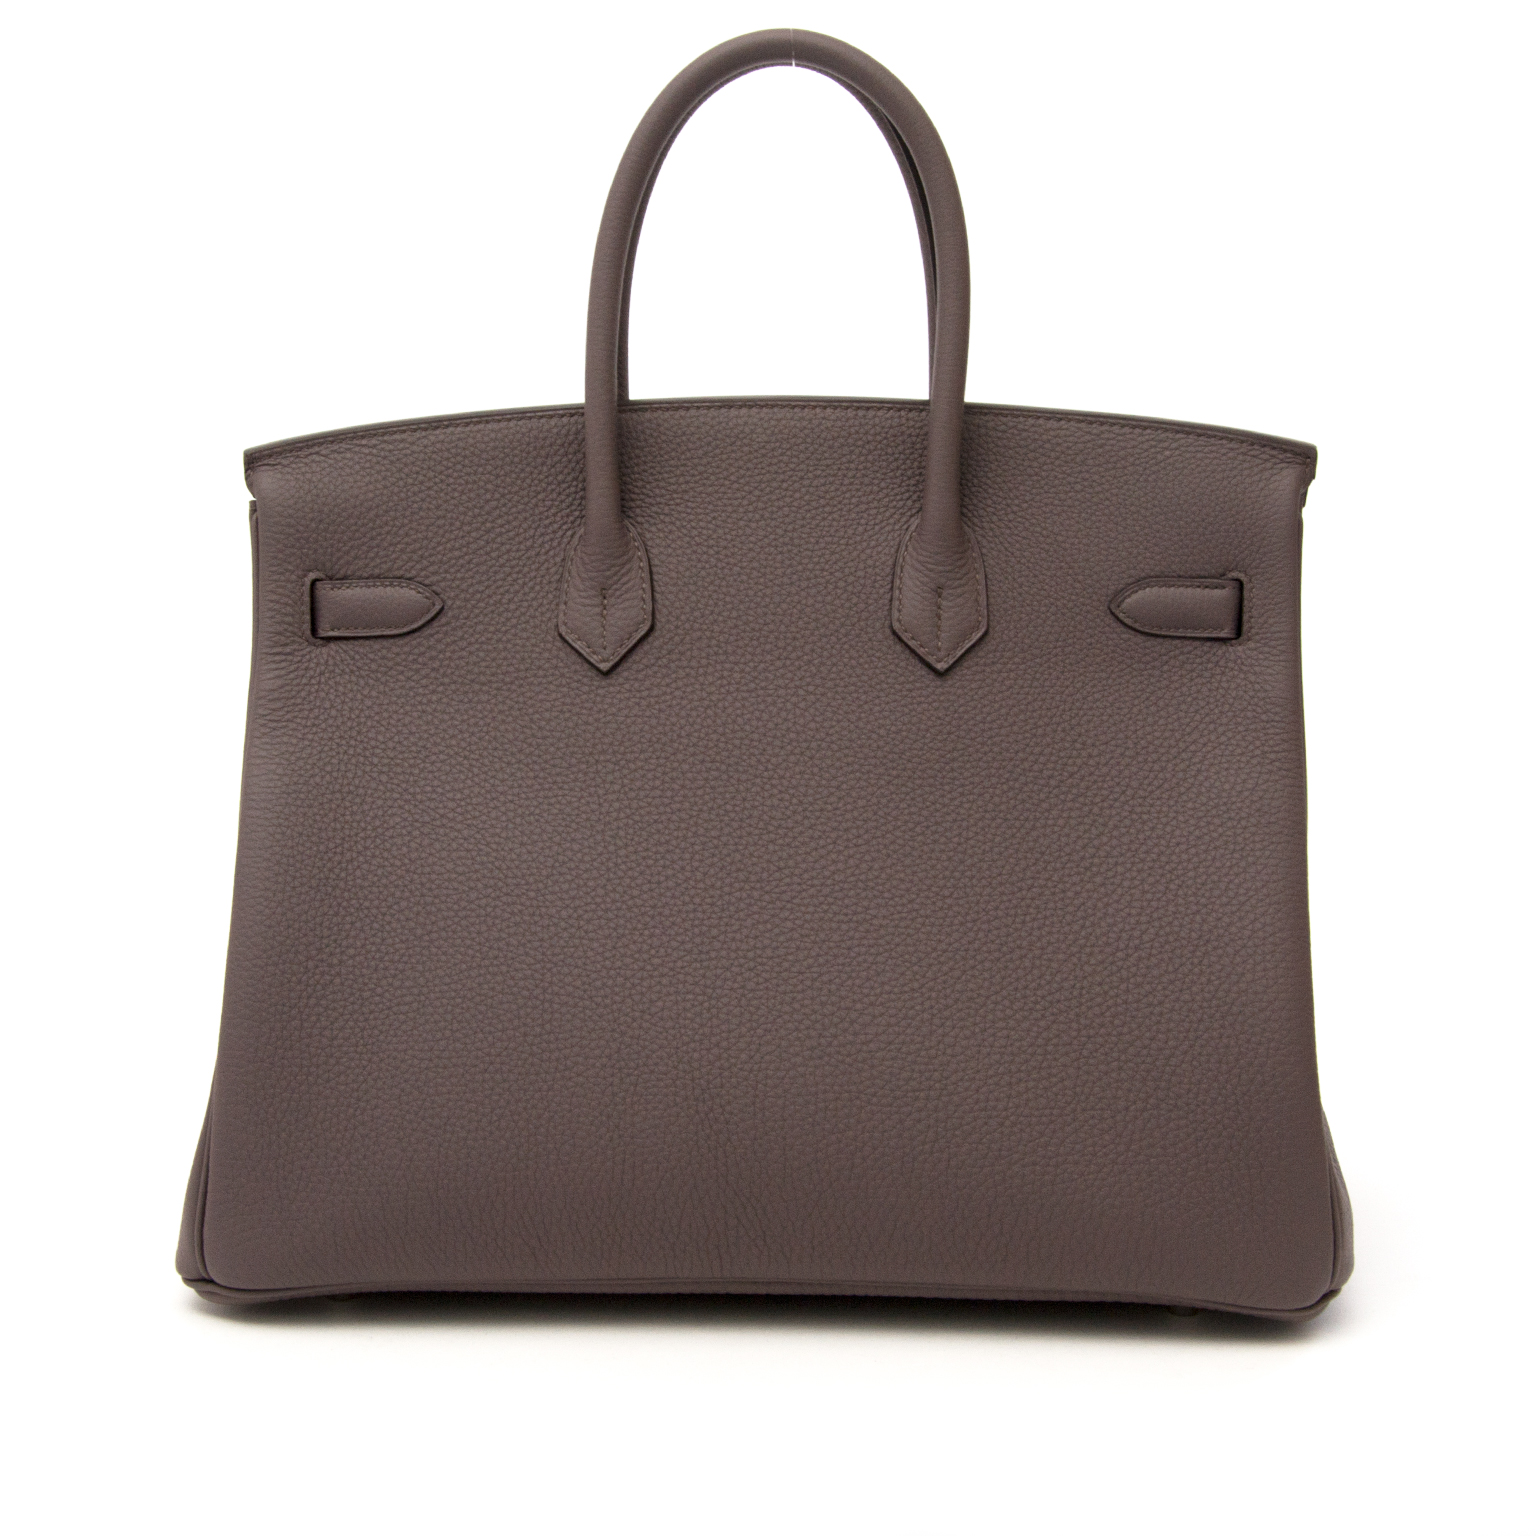 f66f51fe50 ... shop safe online at the best price brand new Brand New Hermès Birkin  Togo 35 PHW